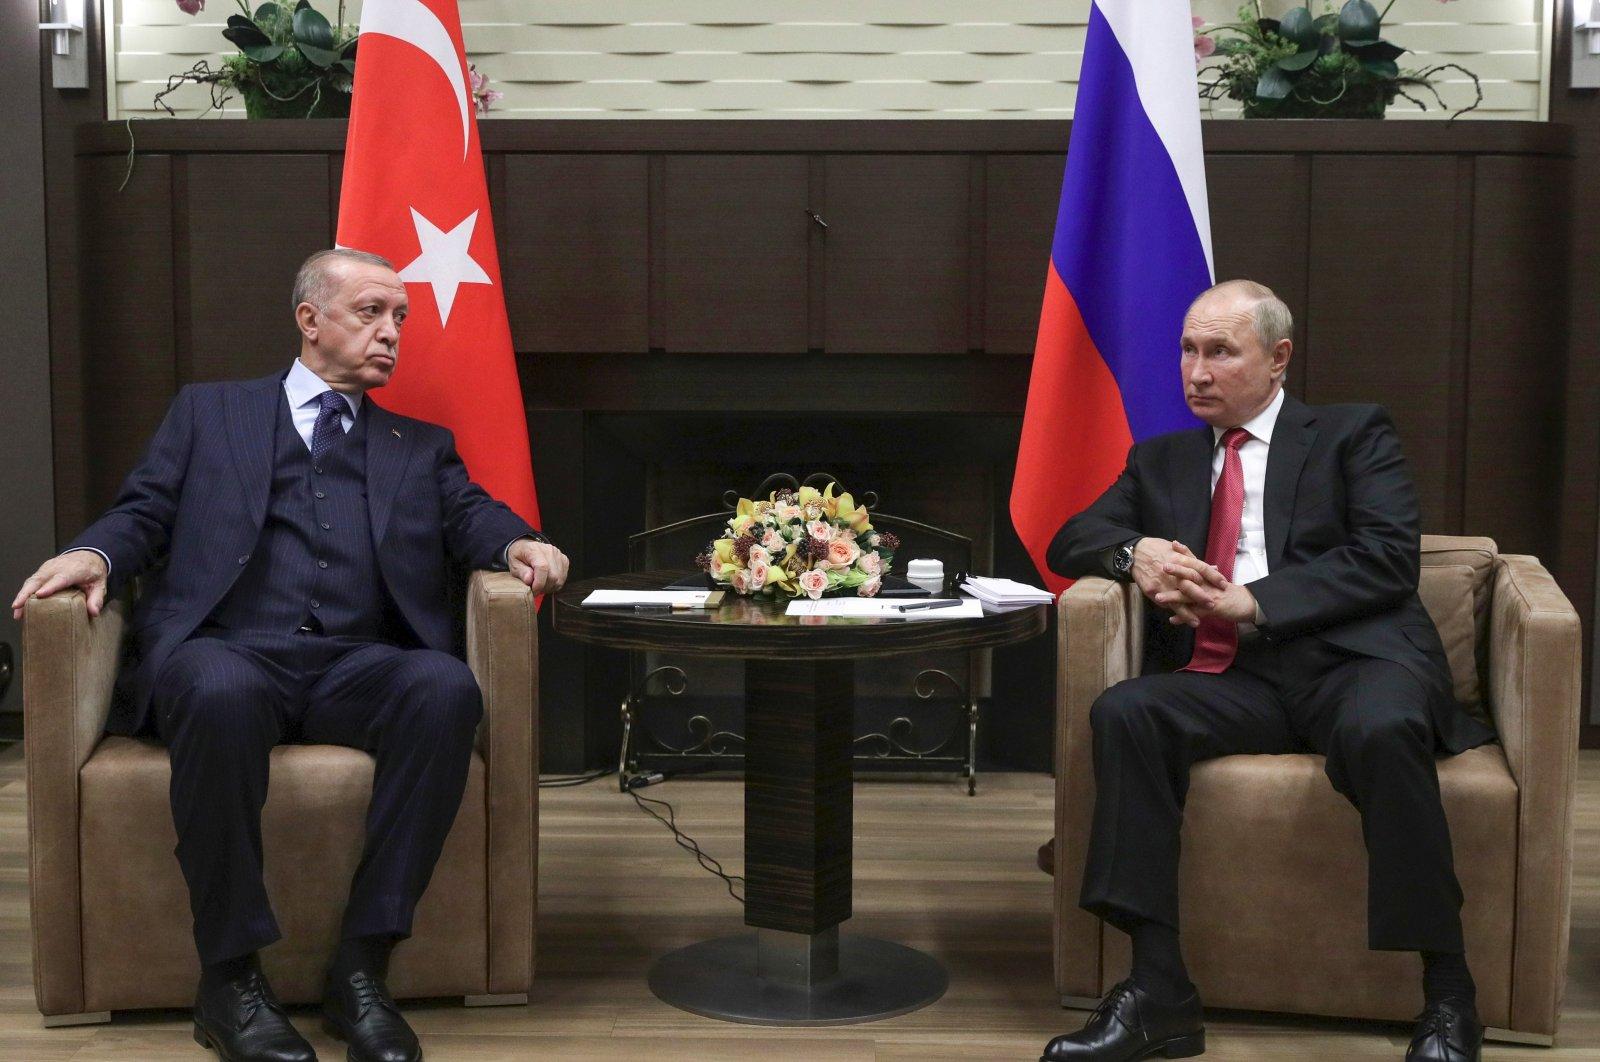 President Recep Tayyip Erdoğan (L) and Russian President Vladimir Putin talk during their meeting in the Bocharov Ruchey residence in the Black Sea resort of Sochi, Russia, Sept. 29, 2021. (AP Photo)